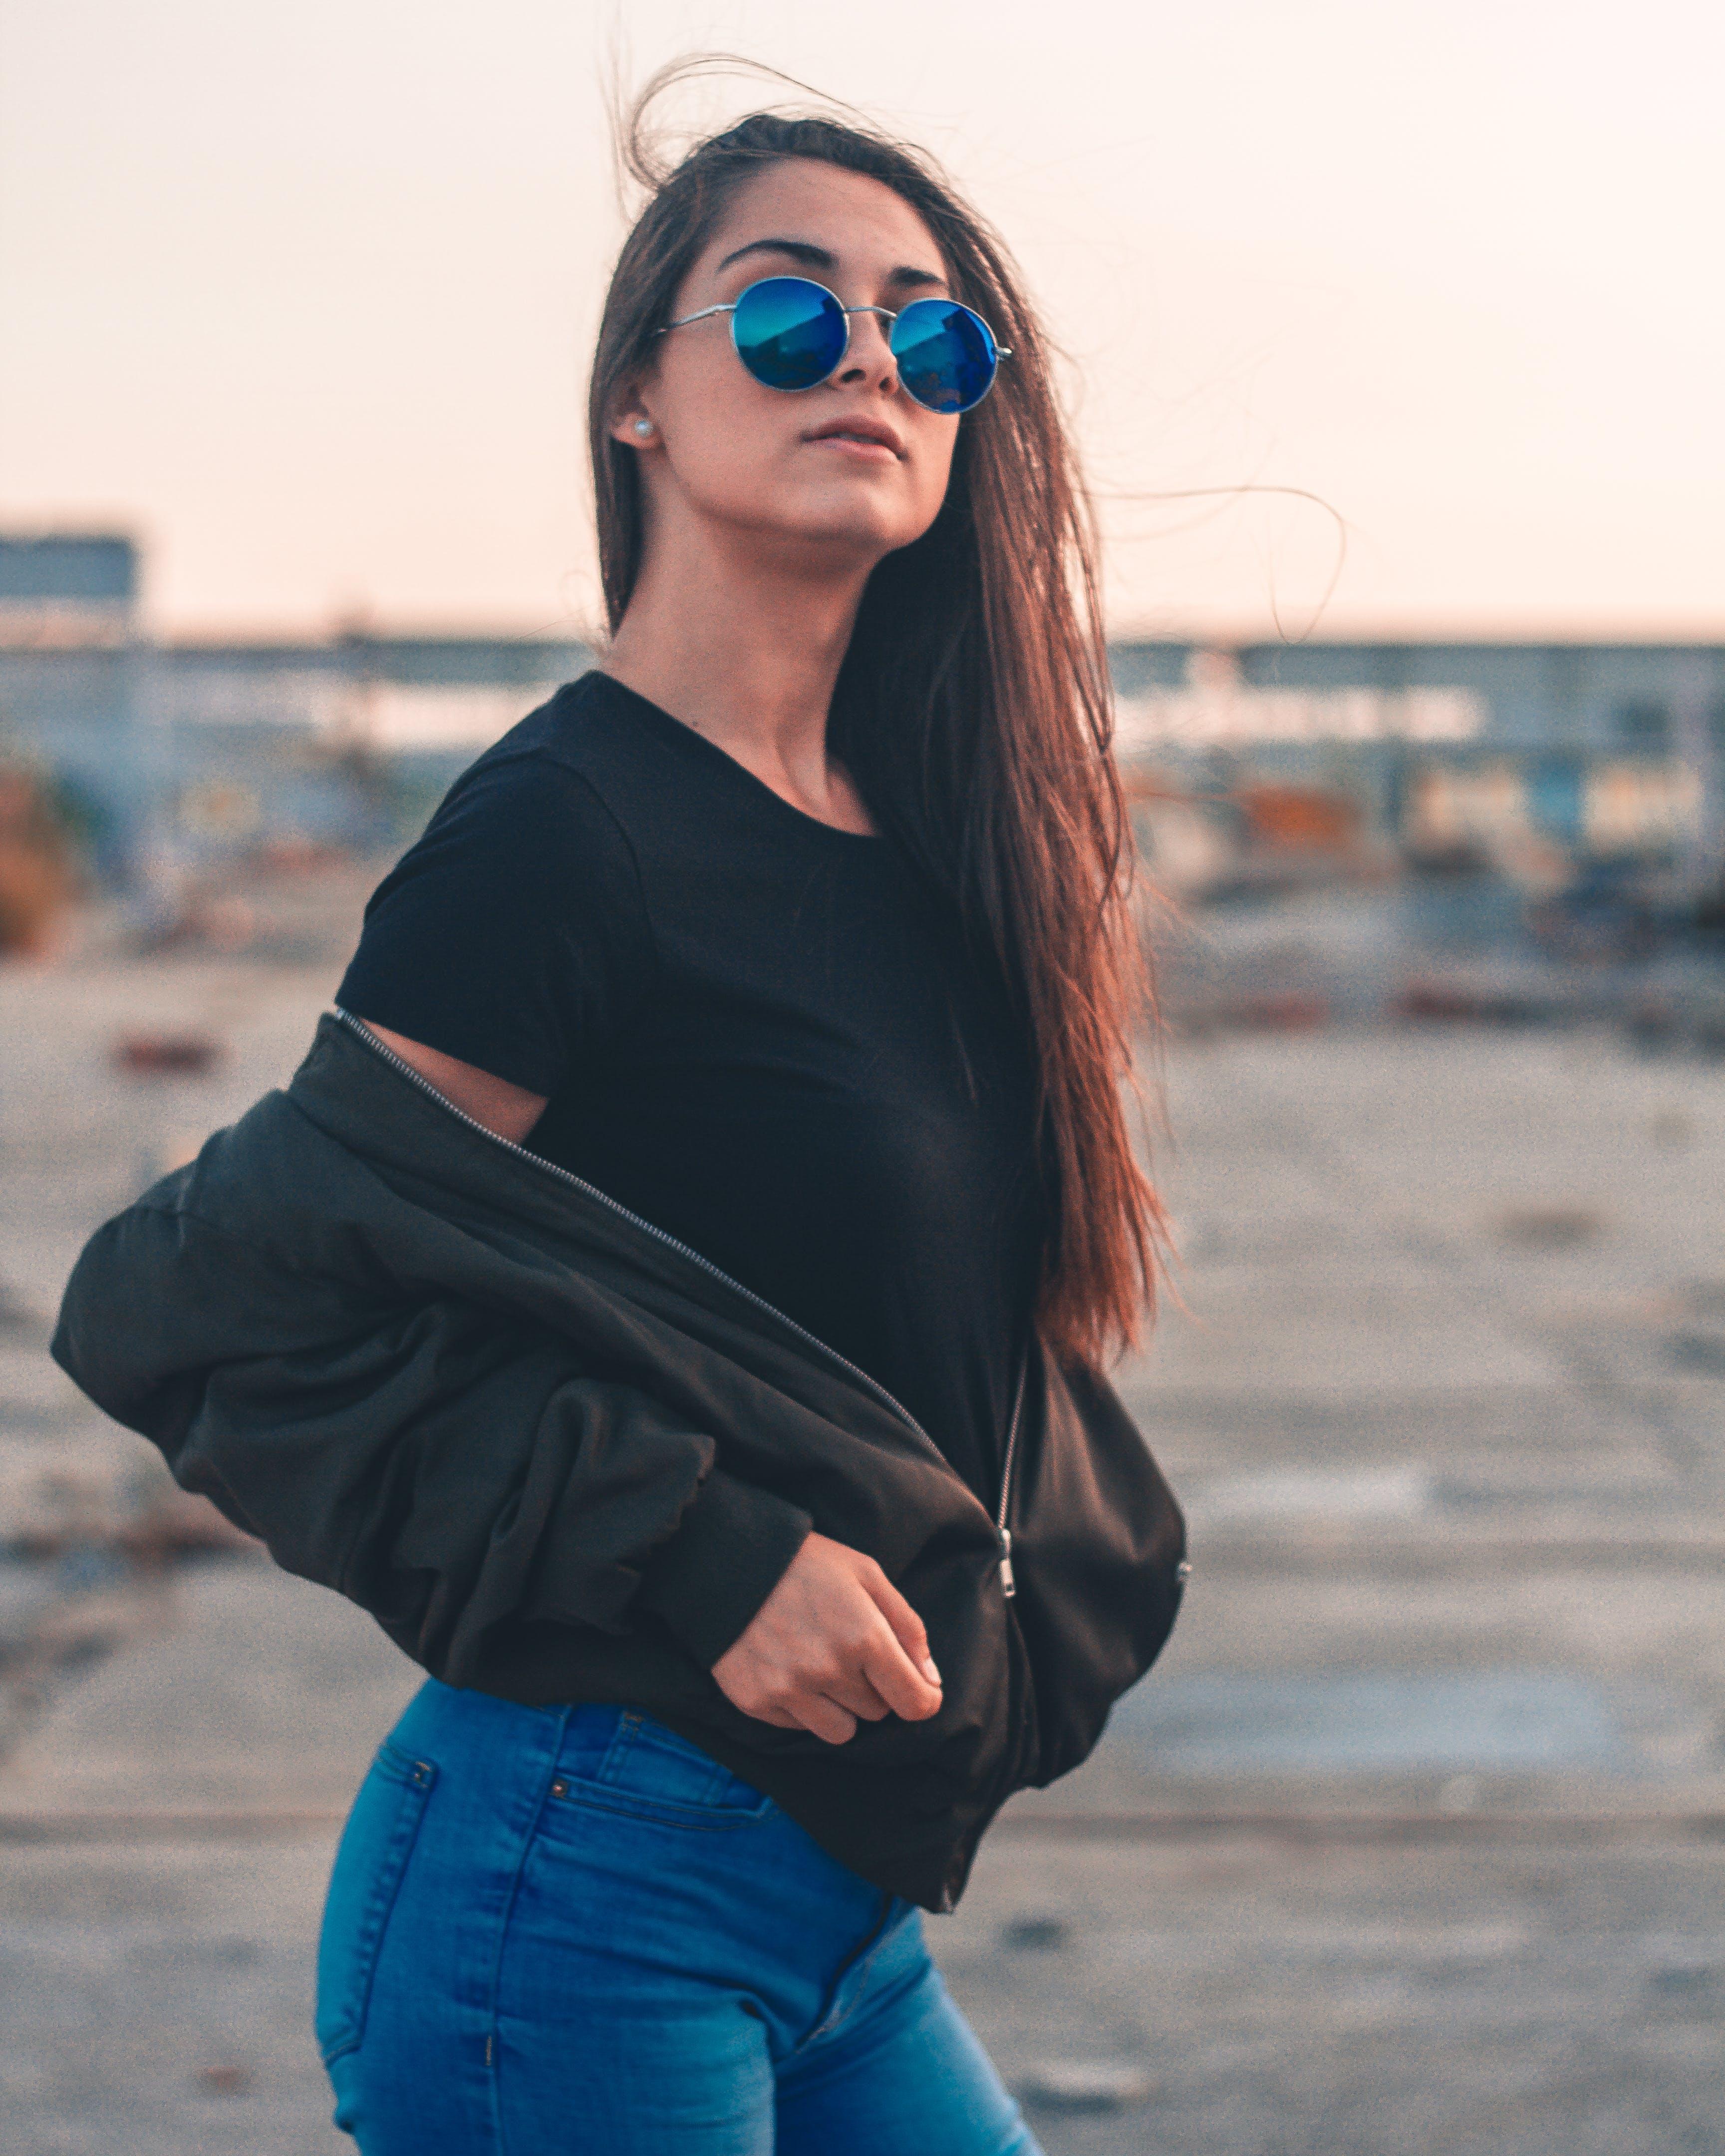 Free stock photo of fashion, person, sunglasses, woman